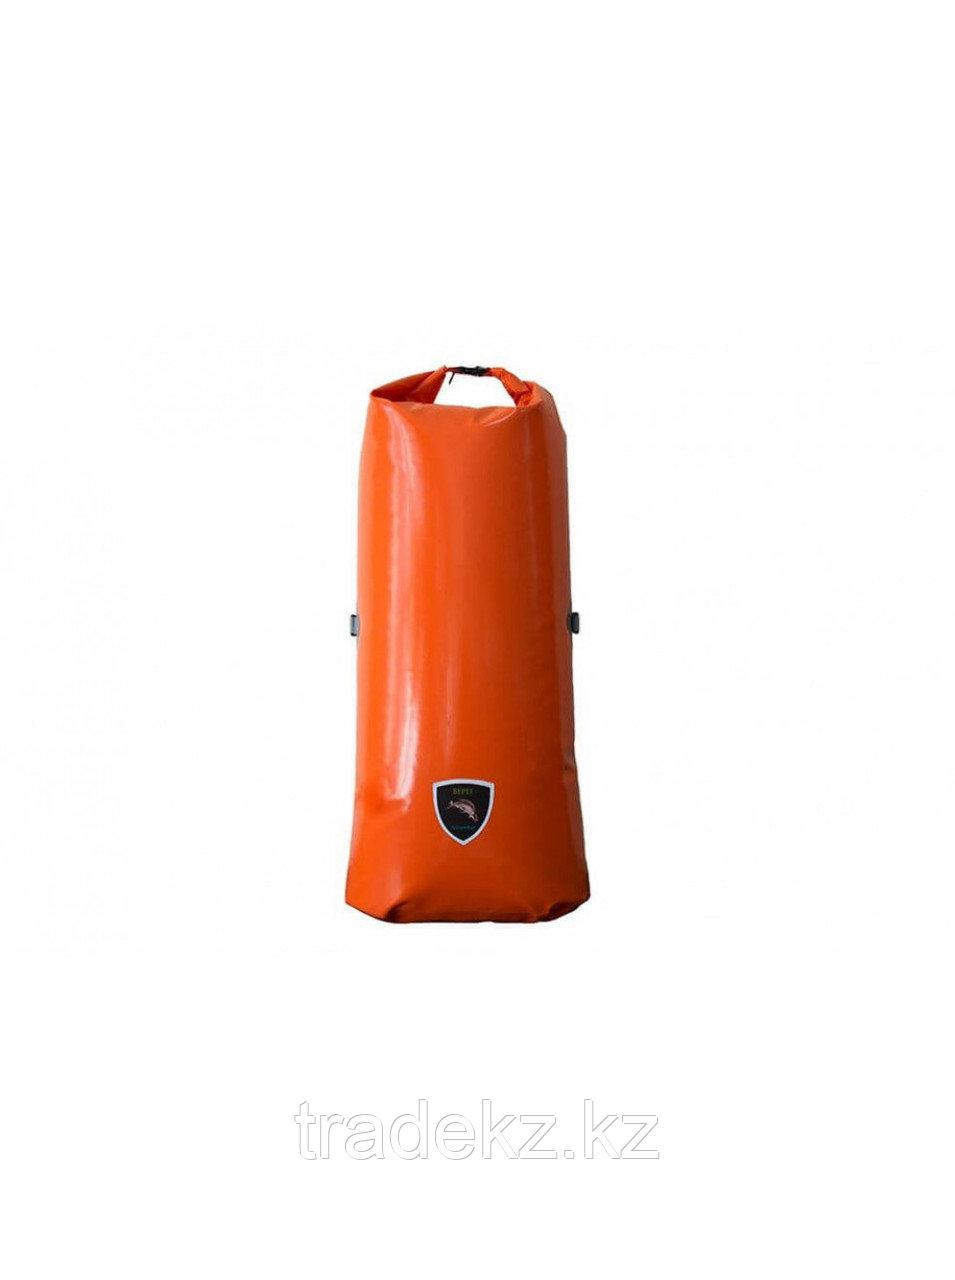 Герморюкзак 110 л. Берег ПВХ 650 гр/м2. С магнитной застежкой и лямками. Вес 1,4 кг.